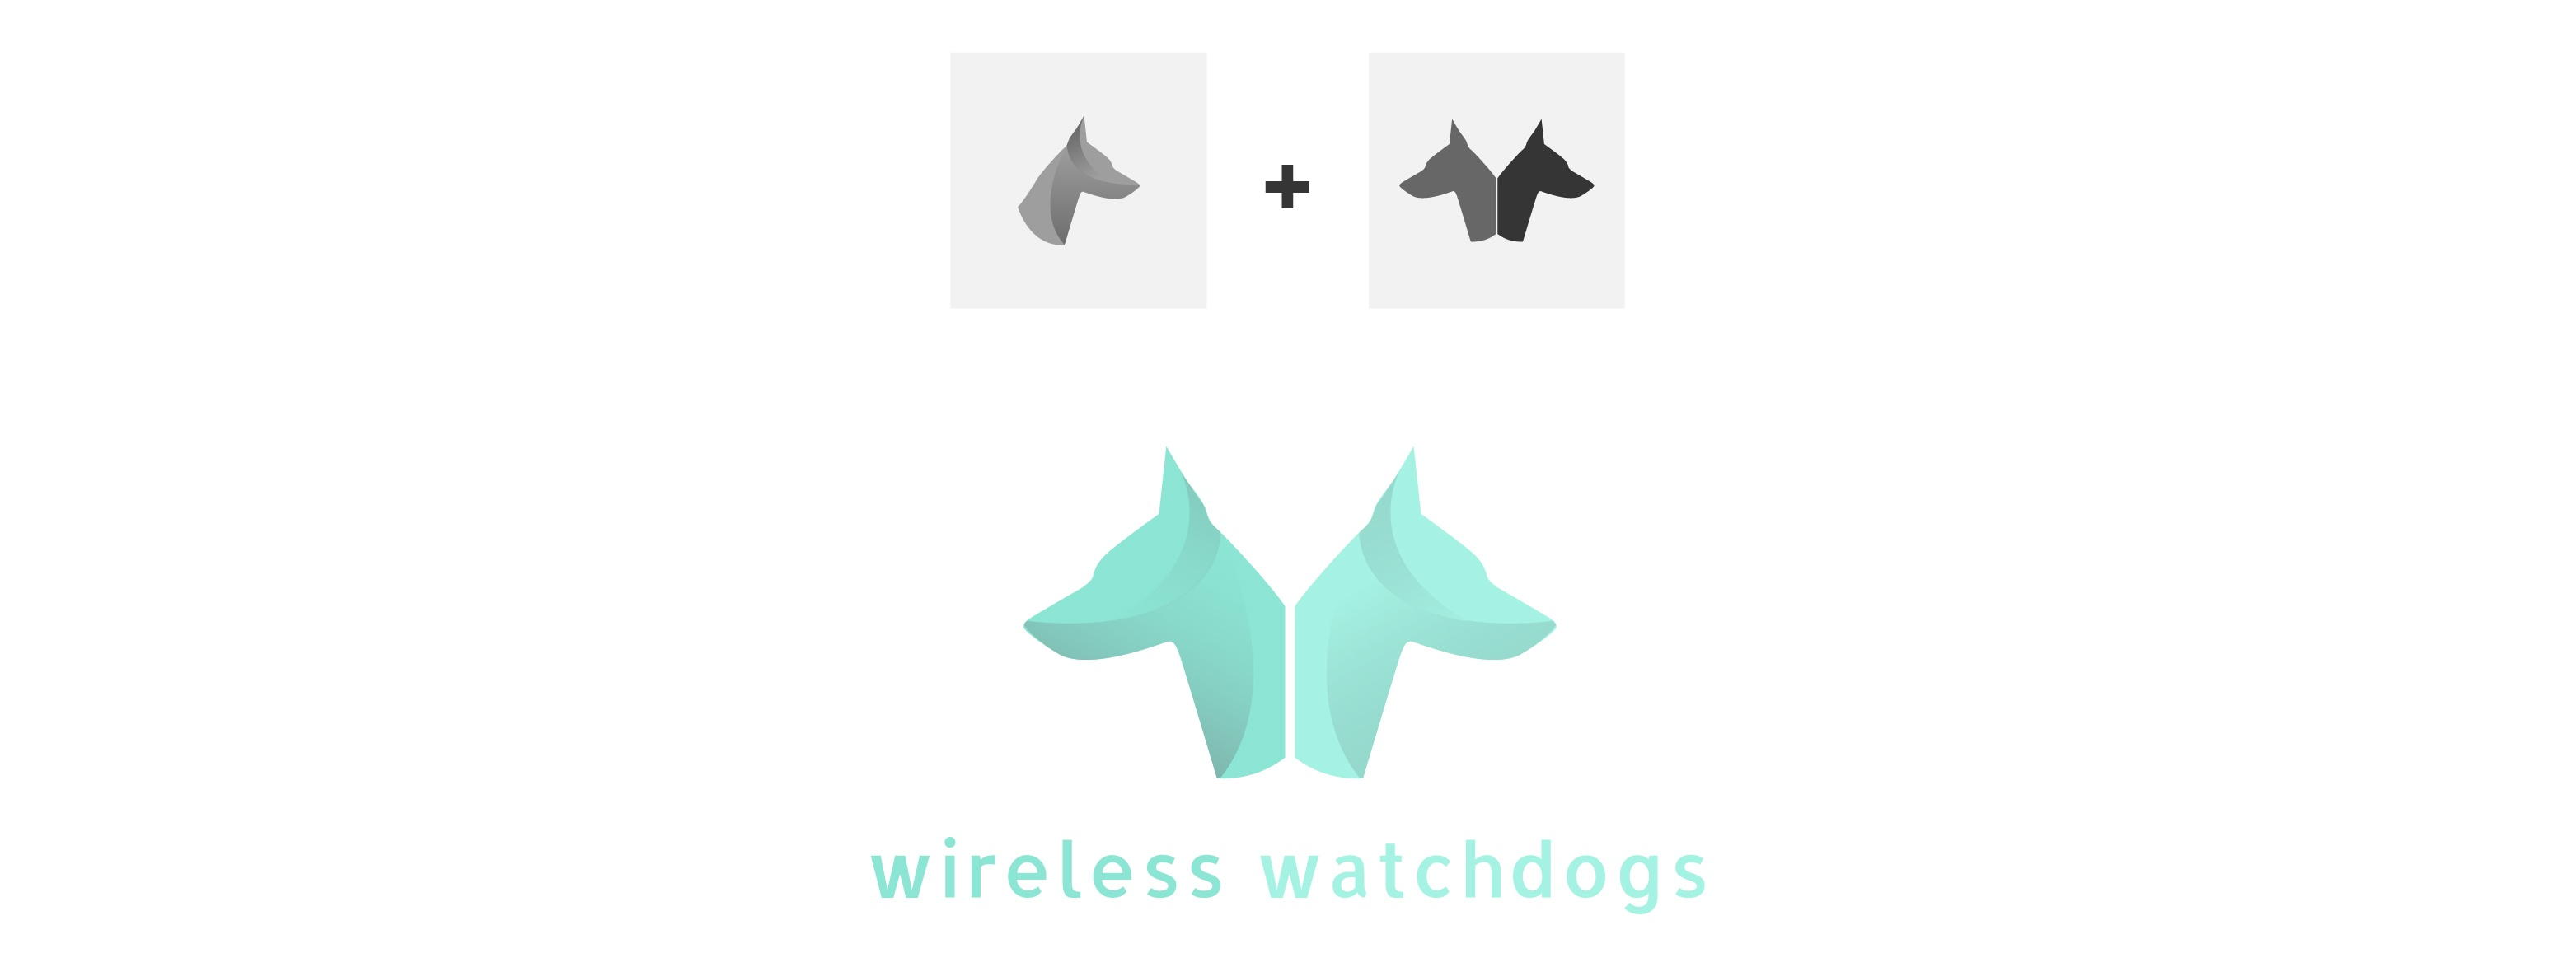 WW_Logo_Redesign_Concept_Sketches-2-05.jpg